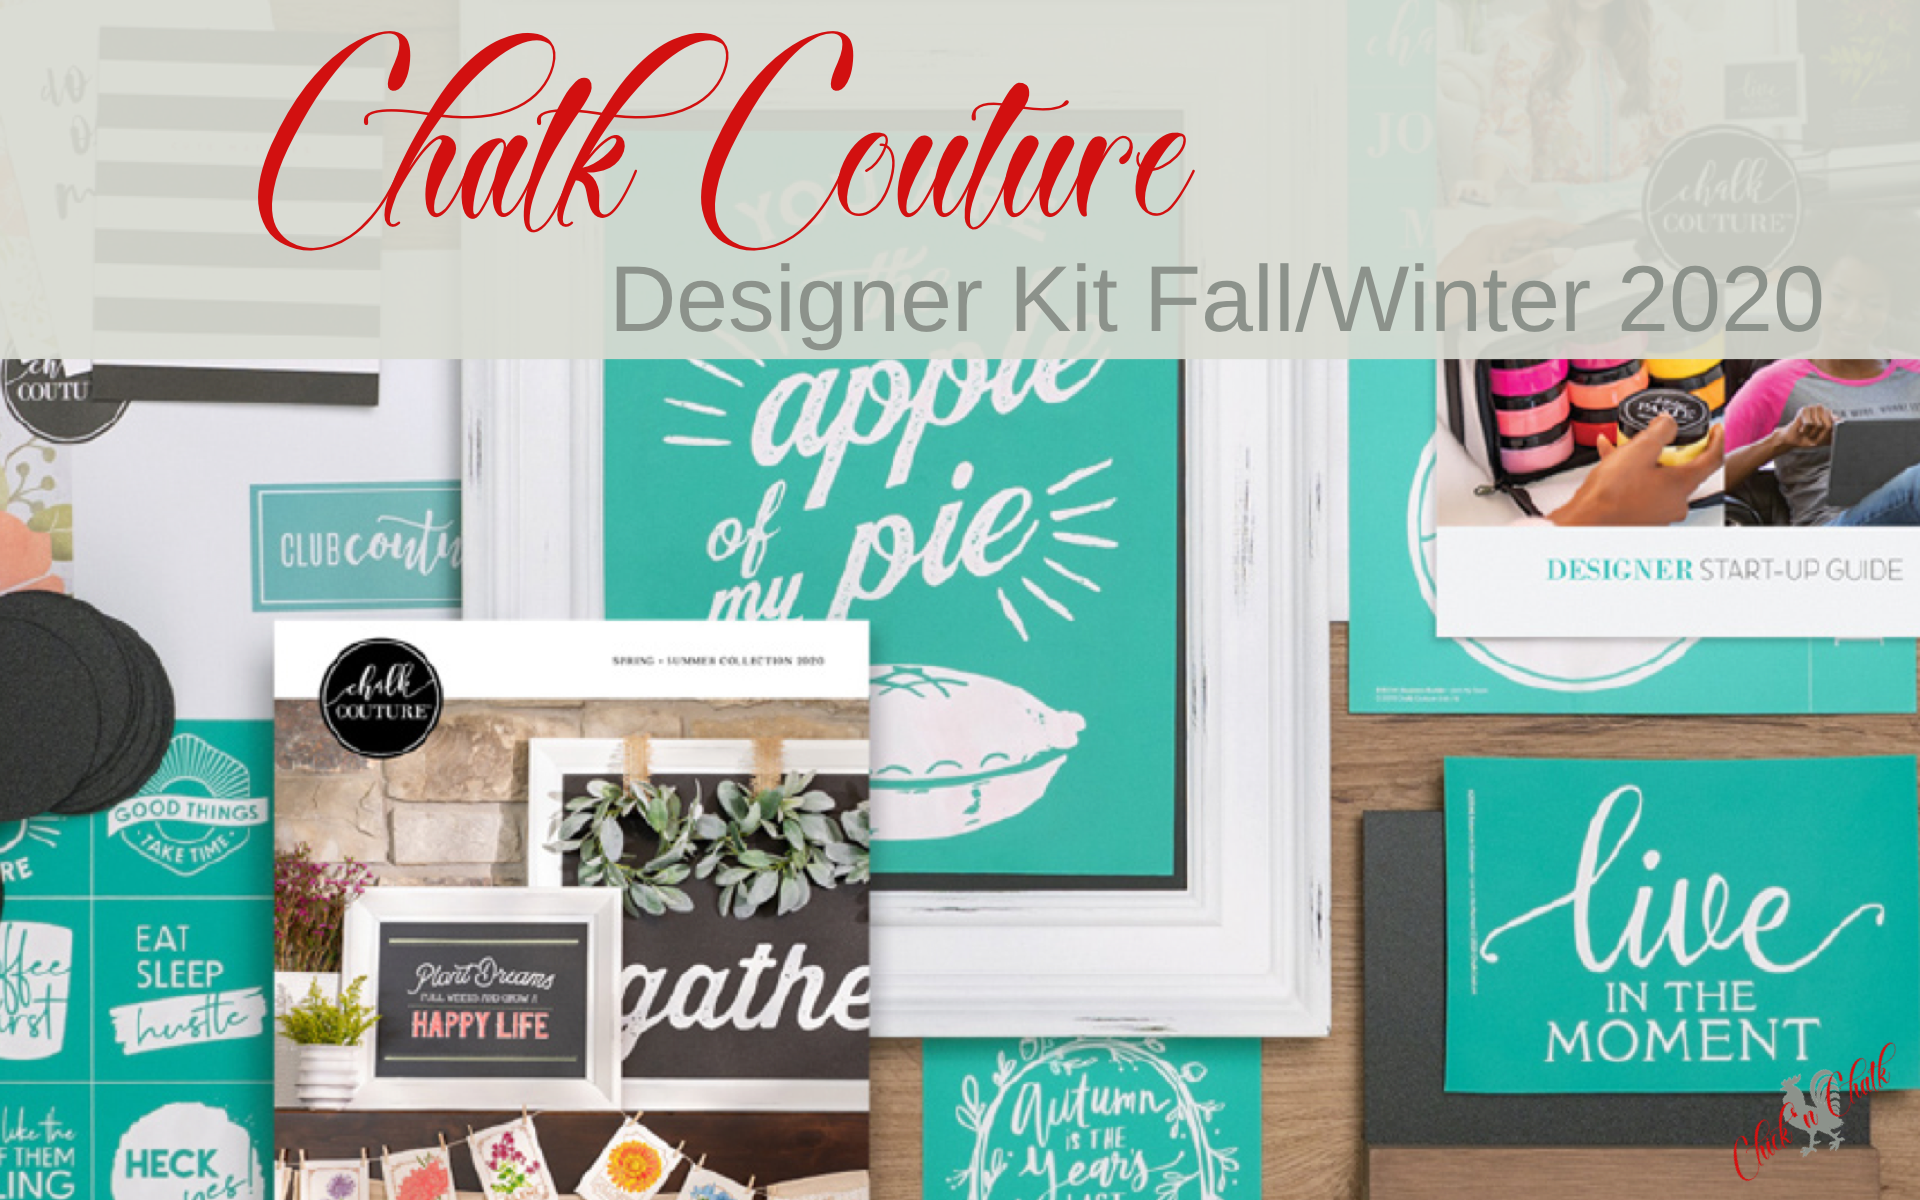 Chalk Couture Designer Kit